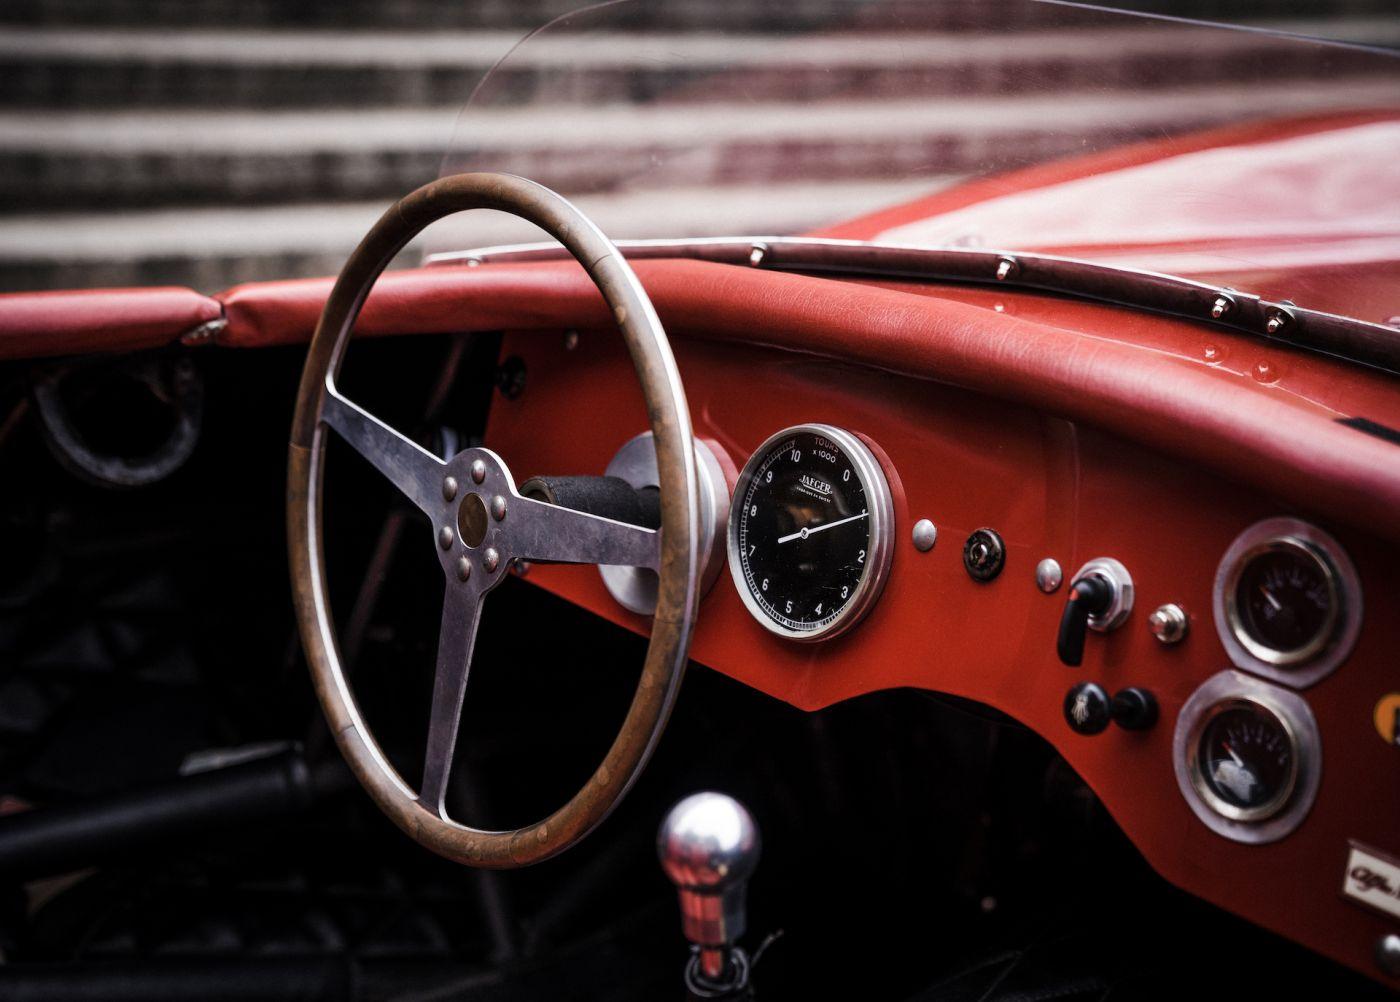 Alfa Romeo Disco Volante DLS_(c)_Kirill_Kirsanov (10)